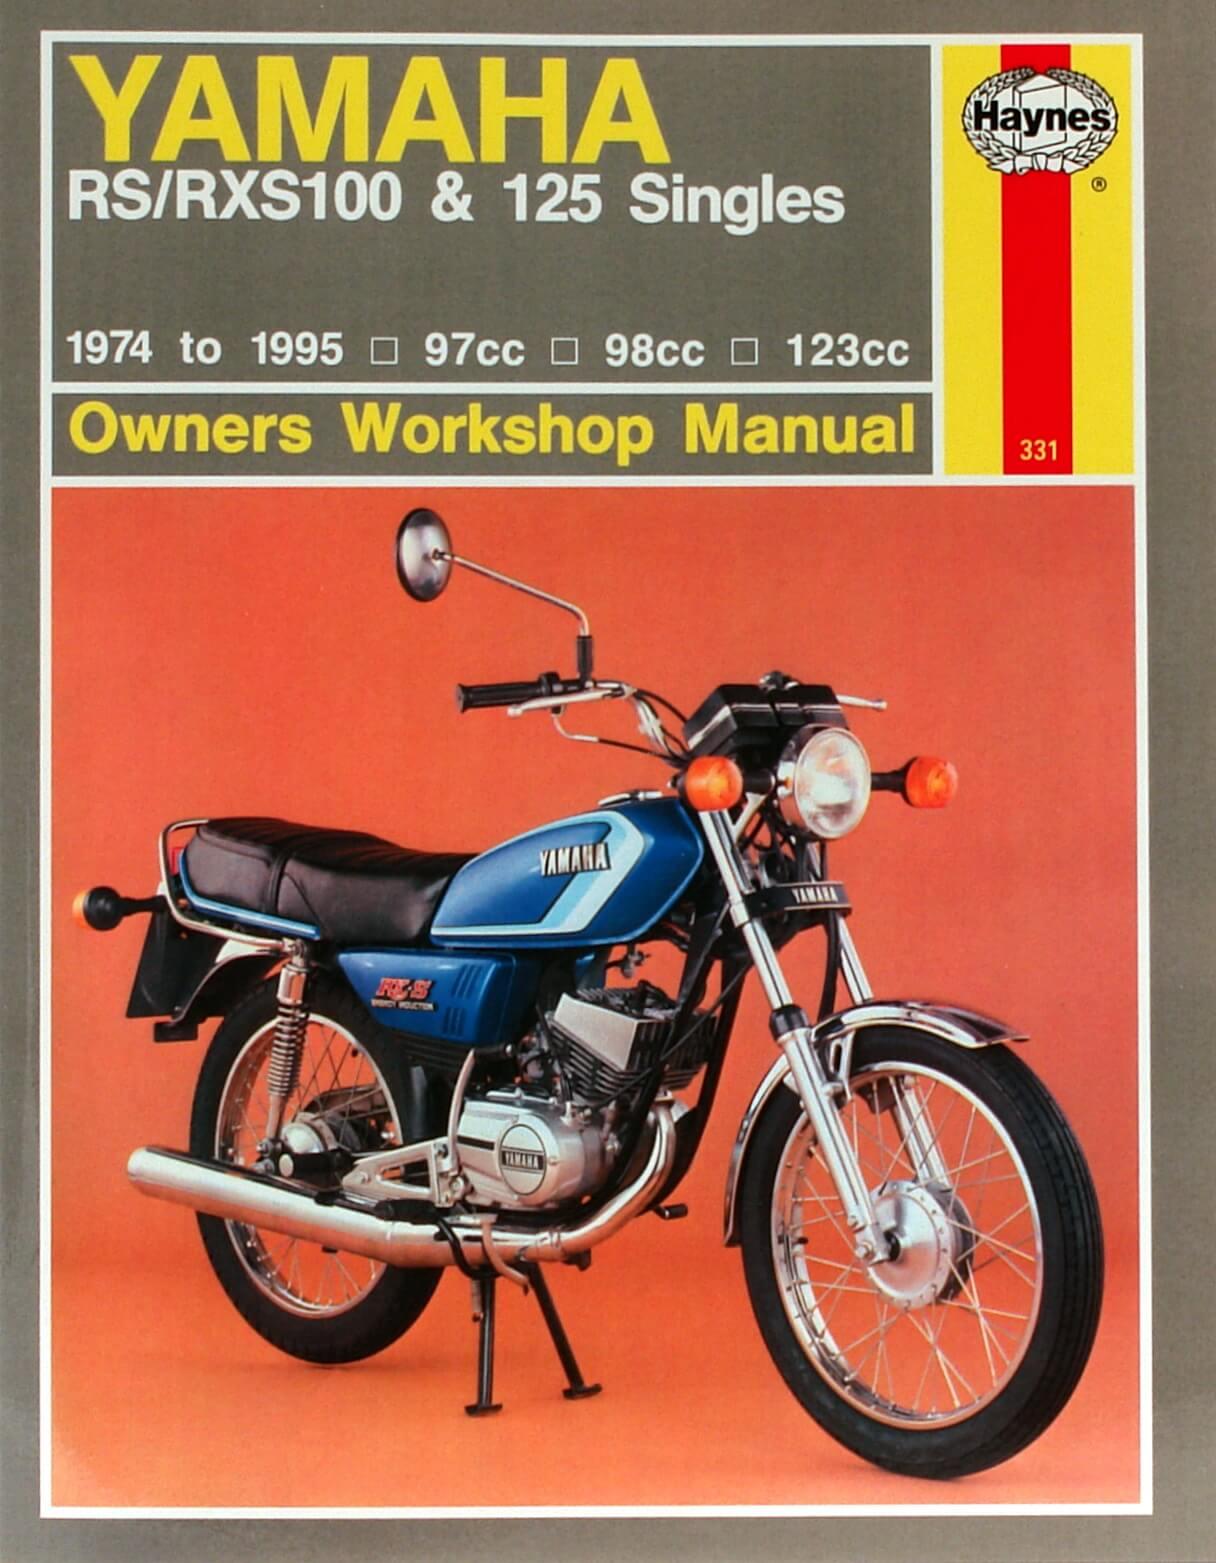 Rx100 Workshop Manual - Man003